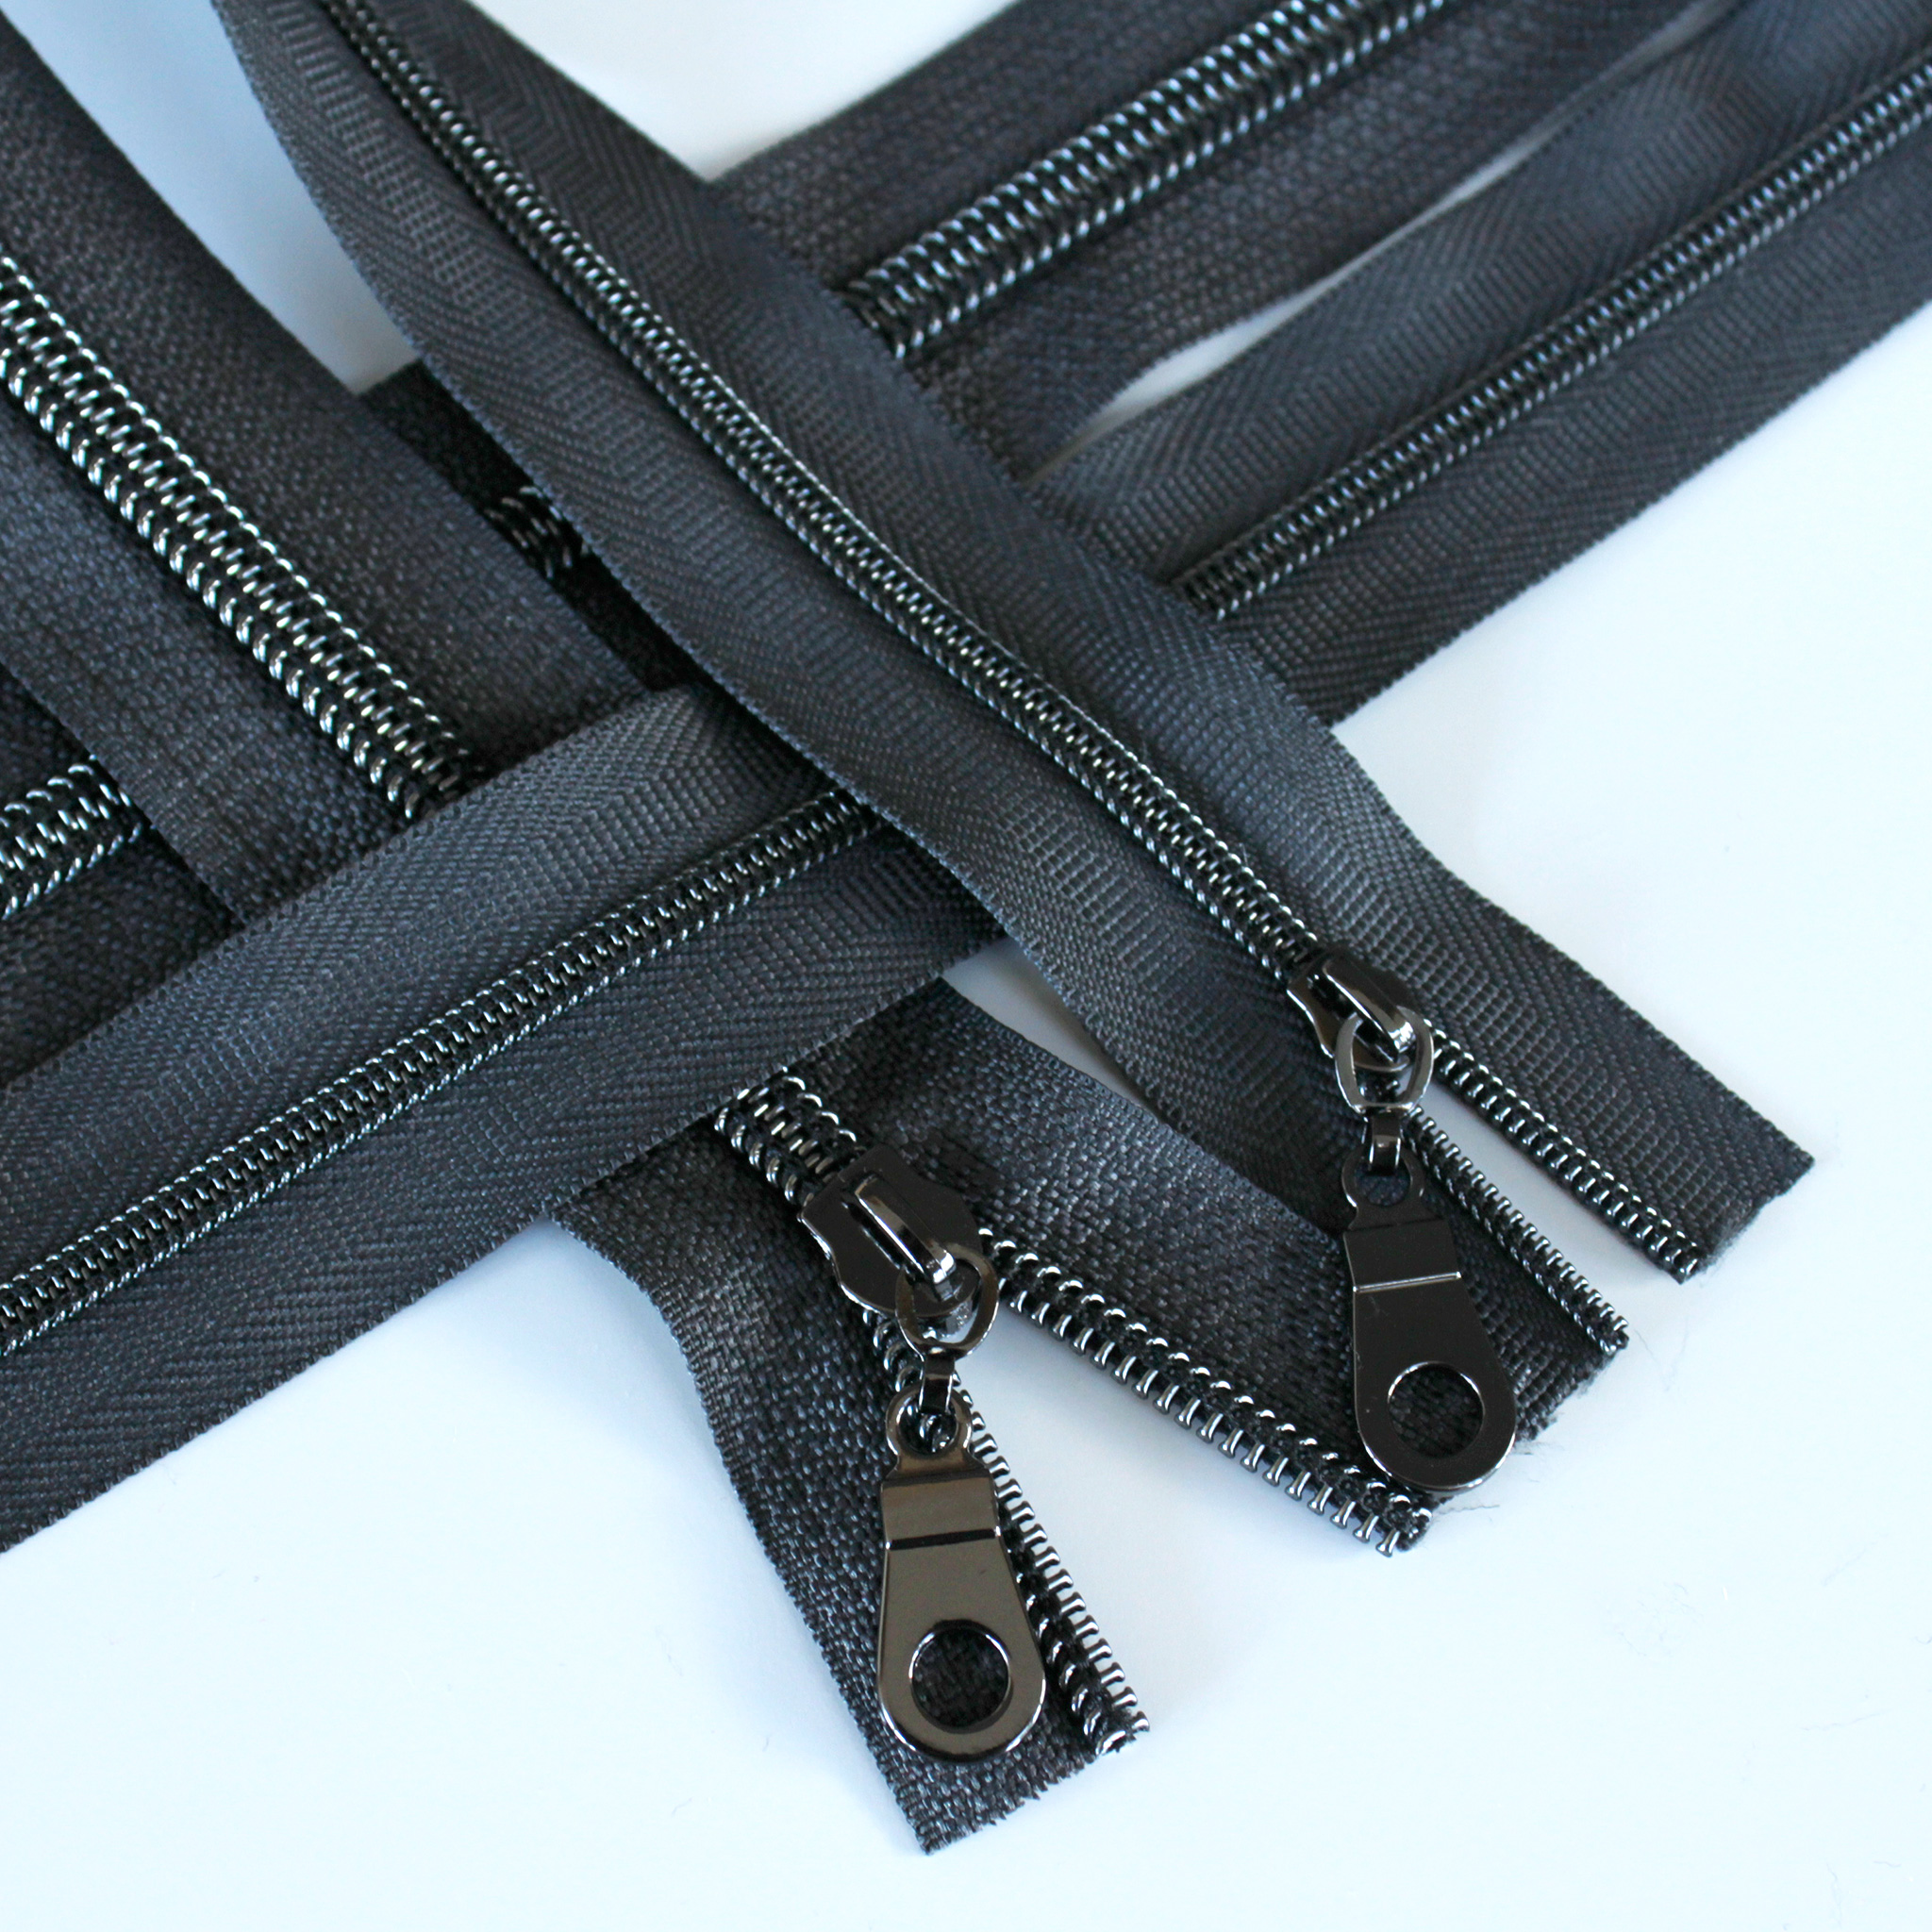 3-5-Nylon-Coil-Zipper-charcoal-with-gunmetal-teeth